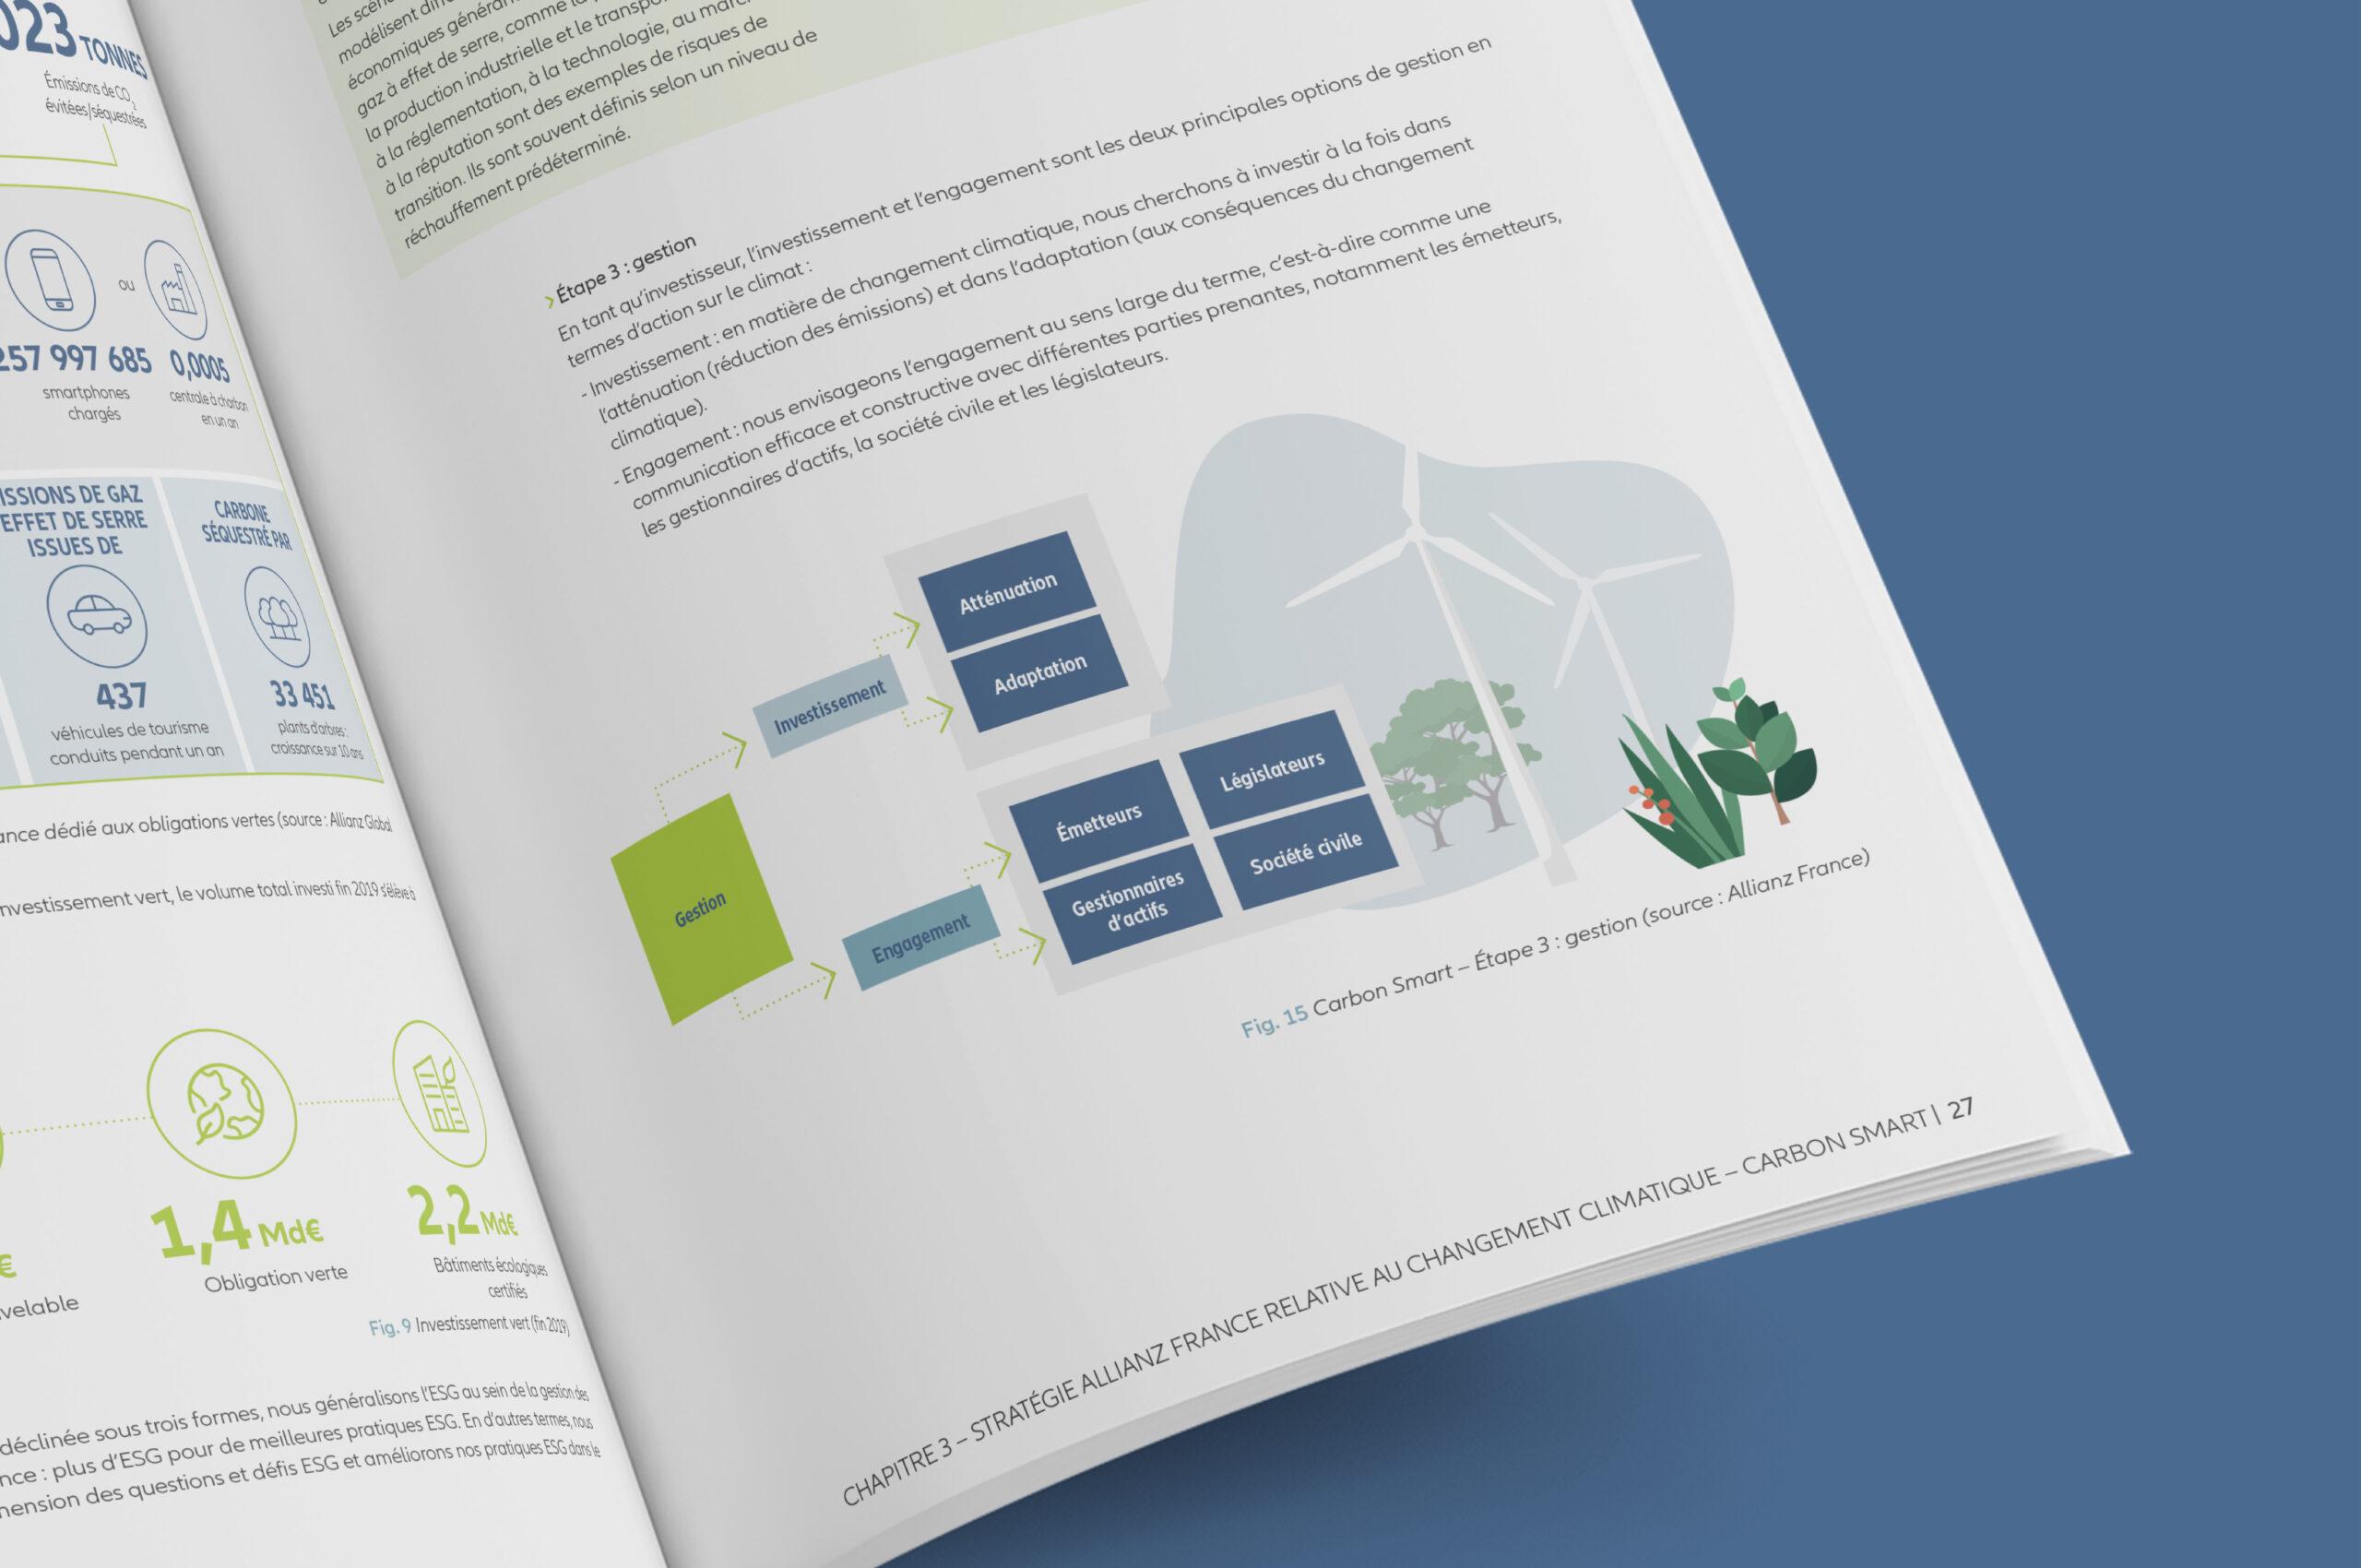 Rapport investissement durable allianz 10